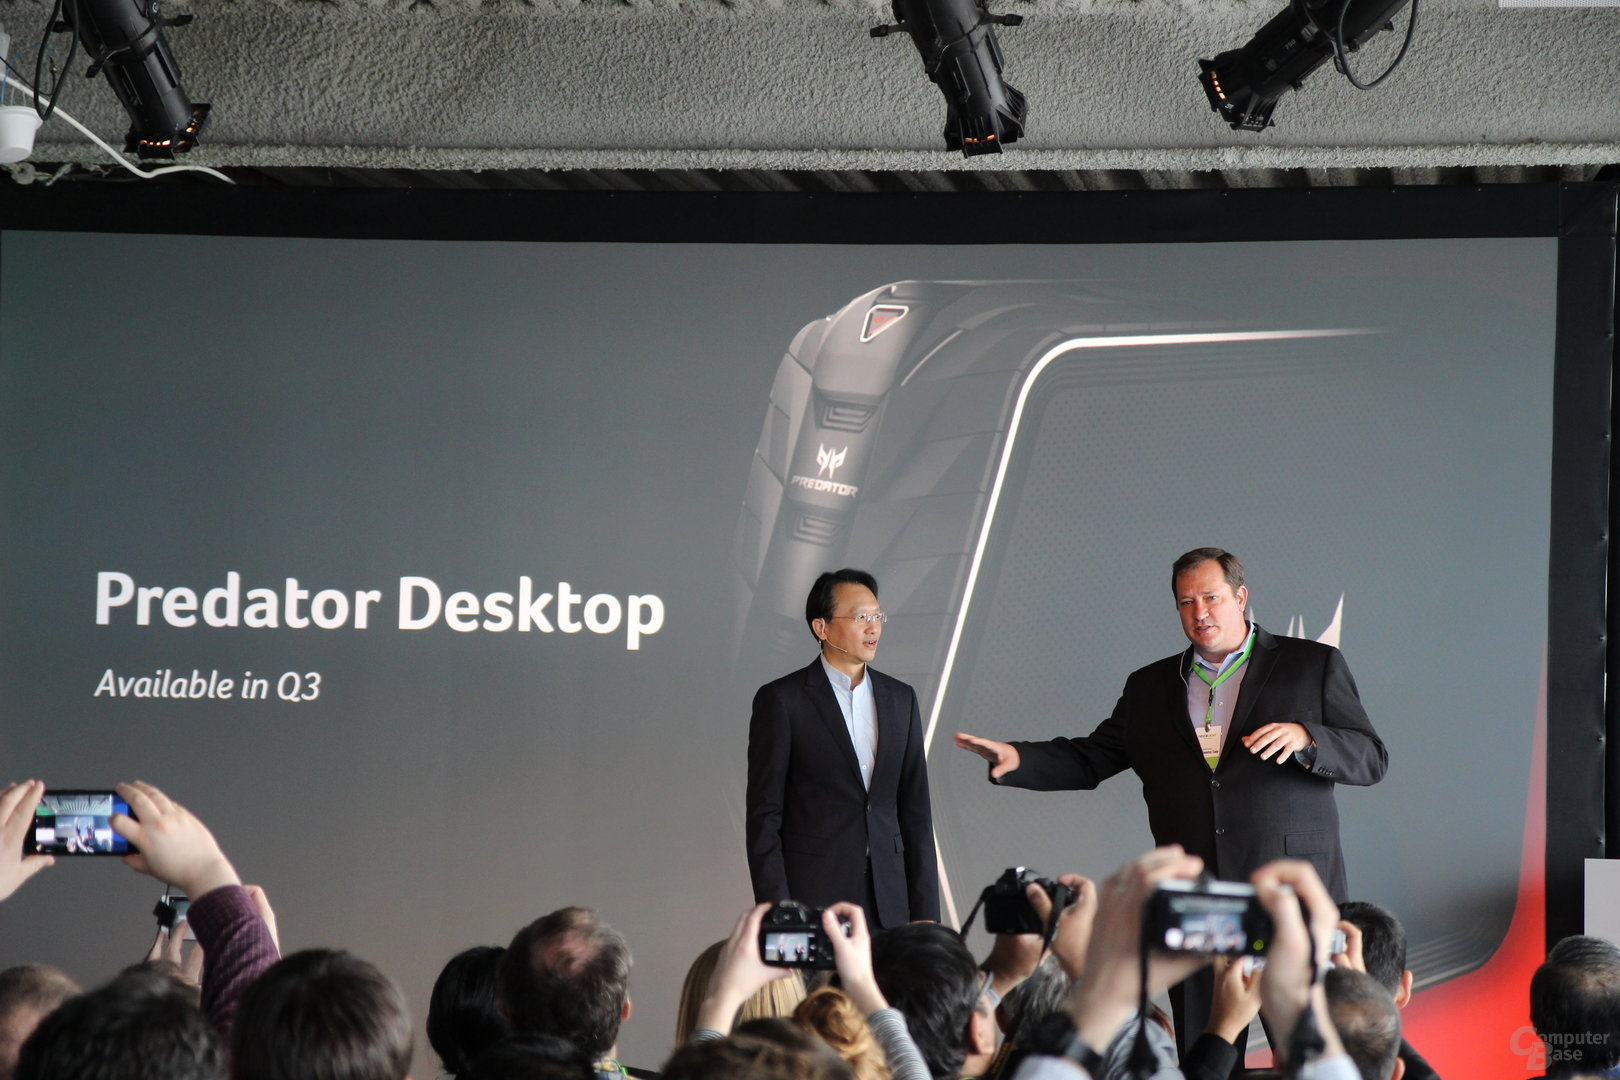 Predator Desktop